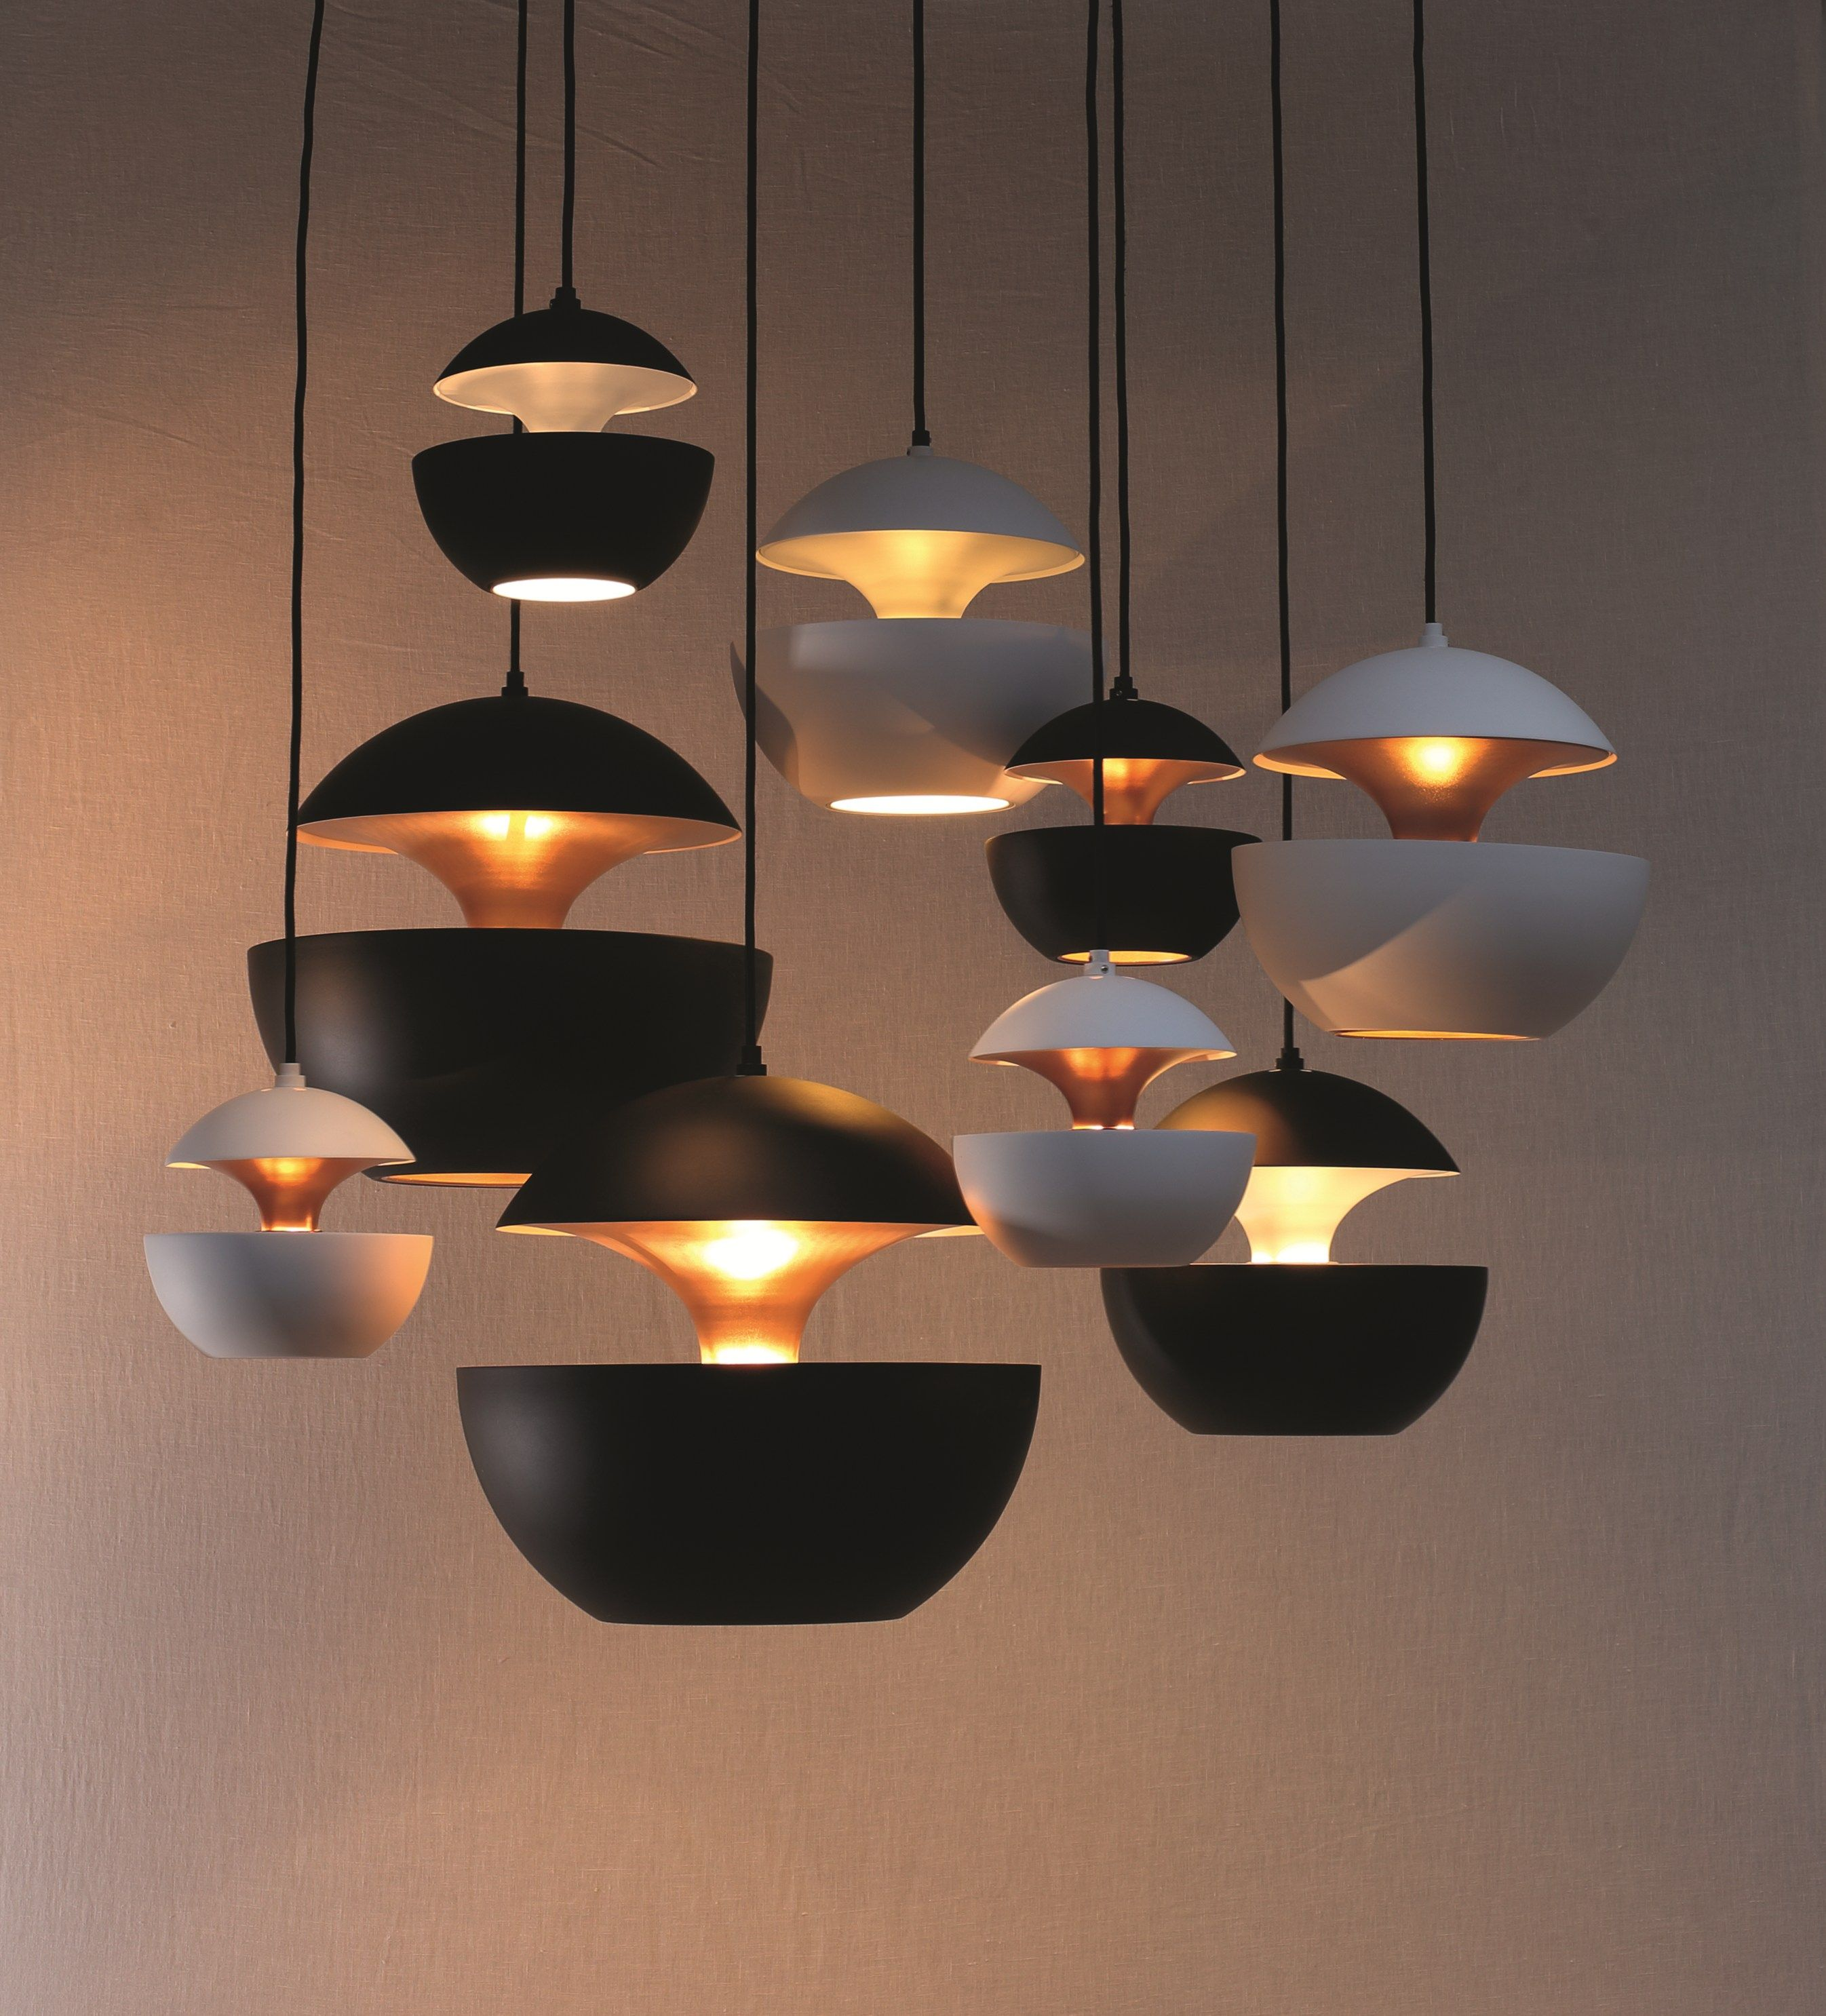 Aluminium Pendant Lamp Hcs Wh 250 Here Comes The Sun